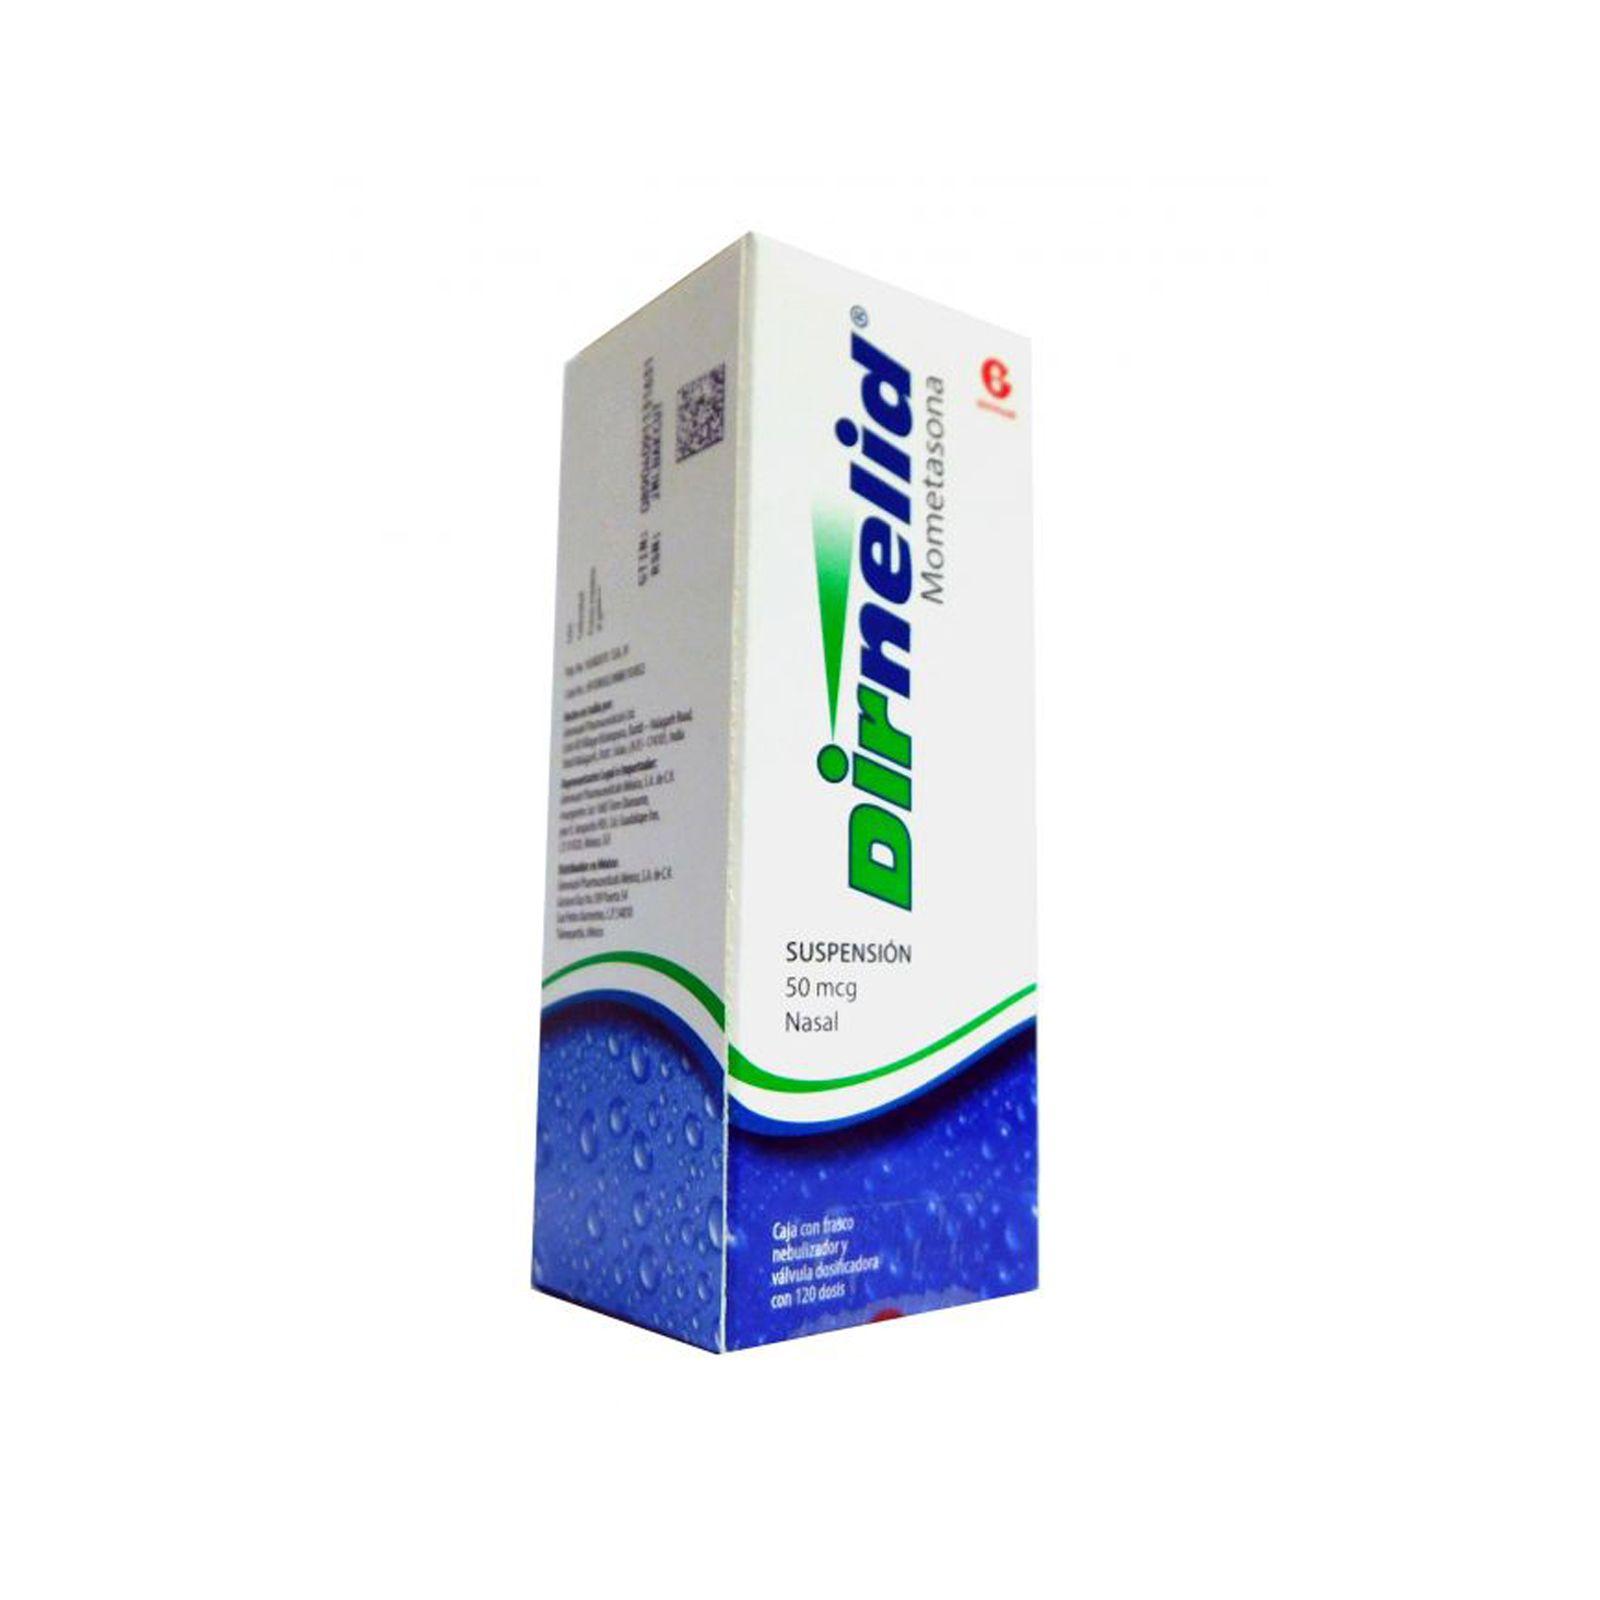 Comprar Dirnelid 120 Dosis 50 Mcg 1 Frasco Spray